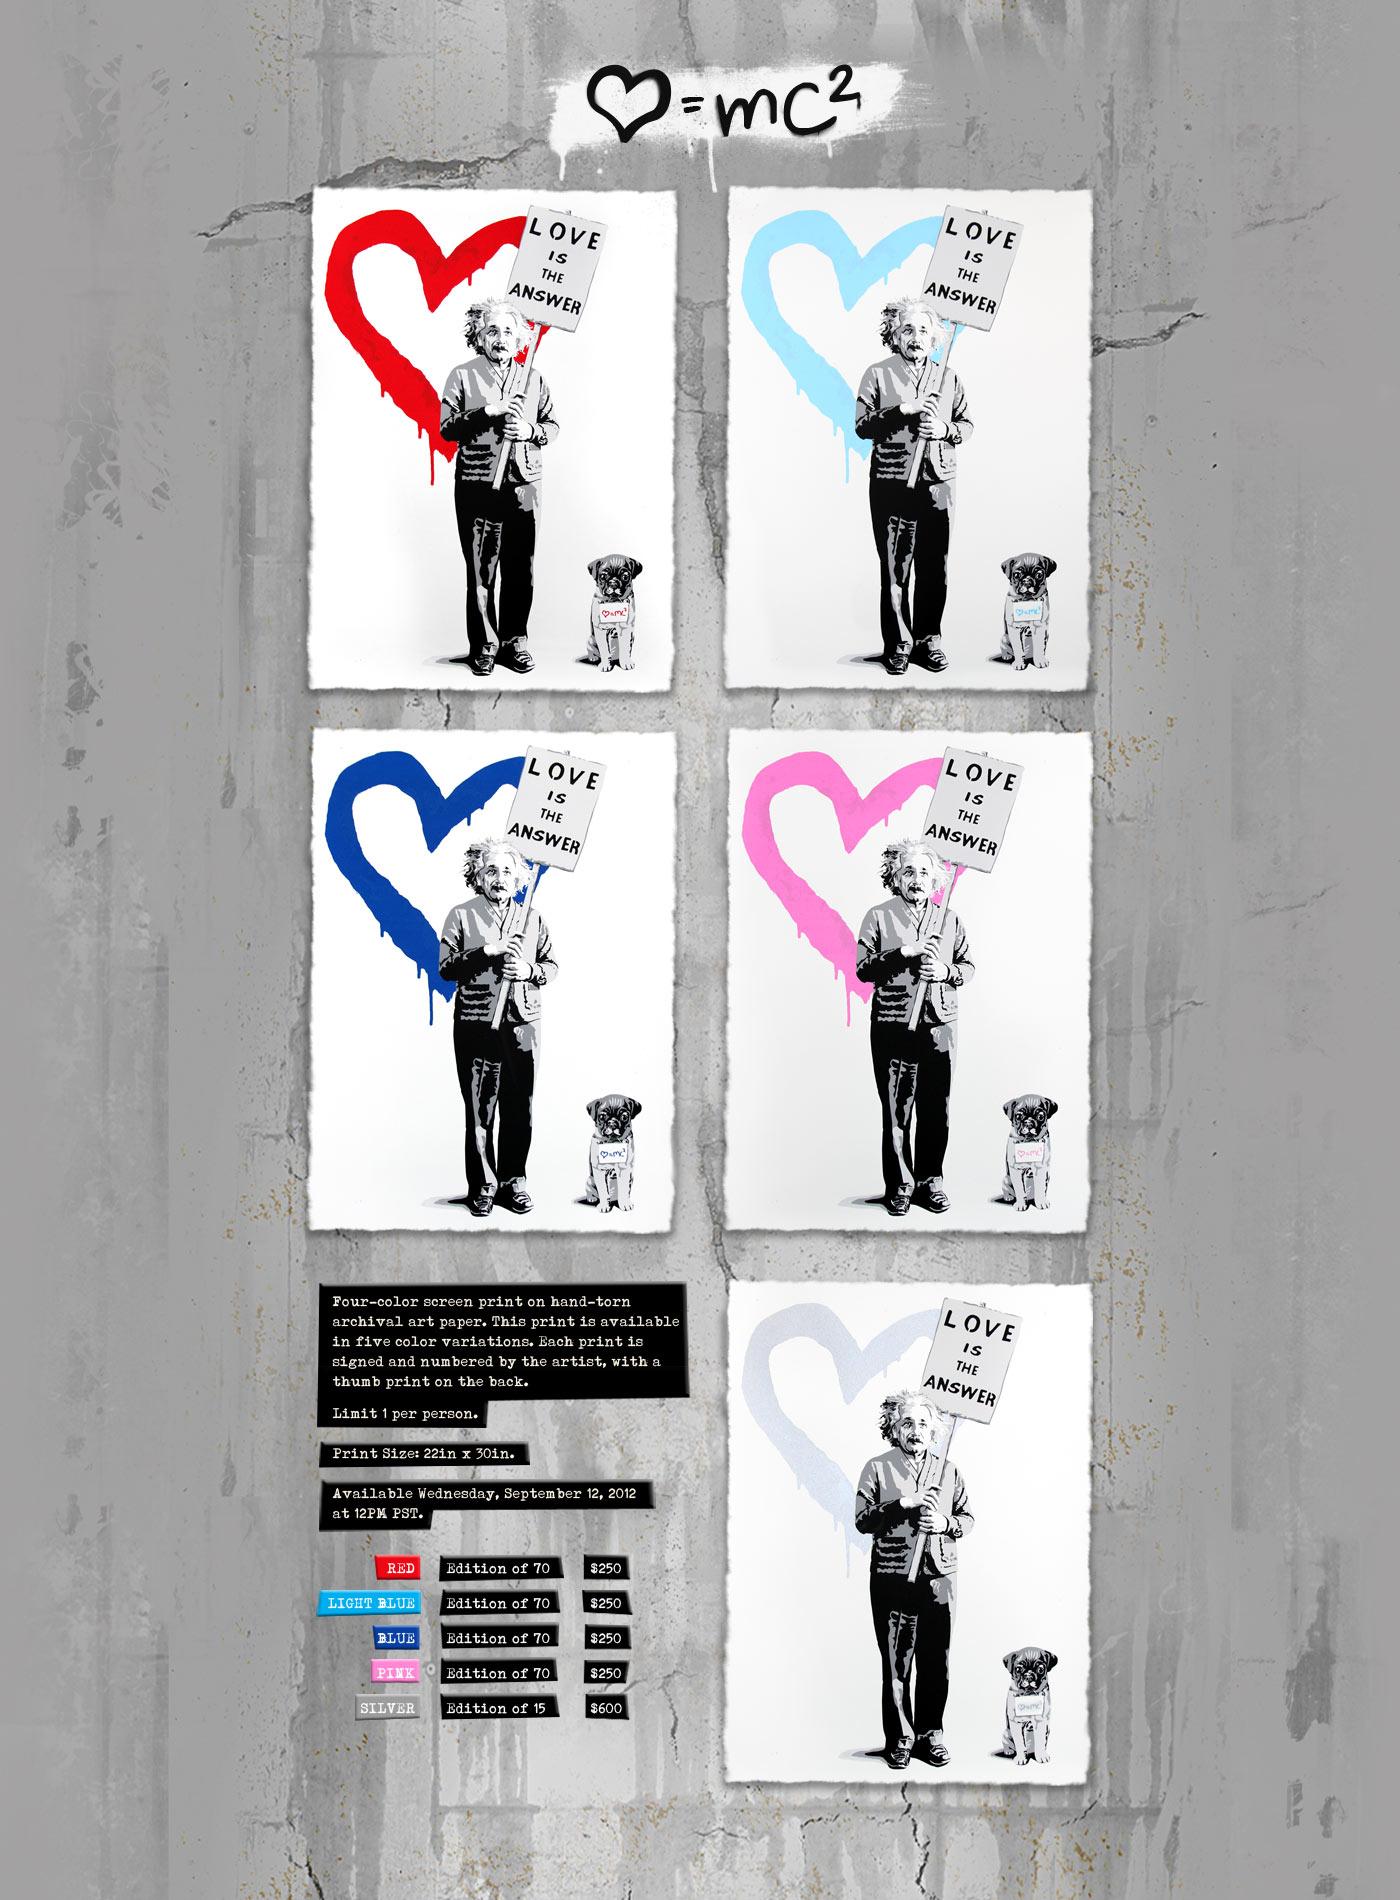 Mr Brainwash - ♥ = mc2, 2012